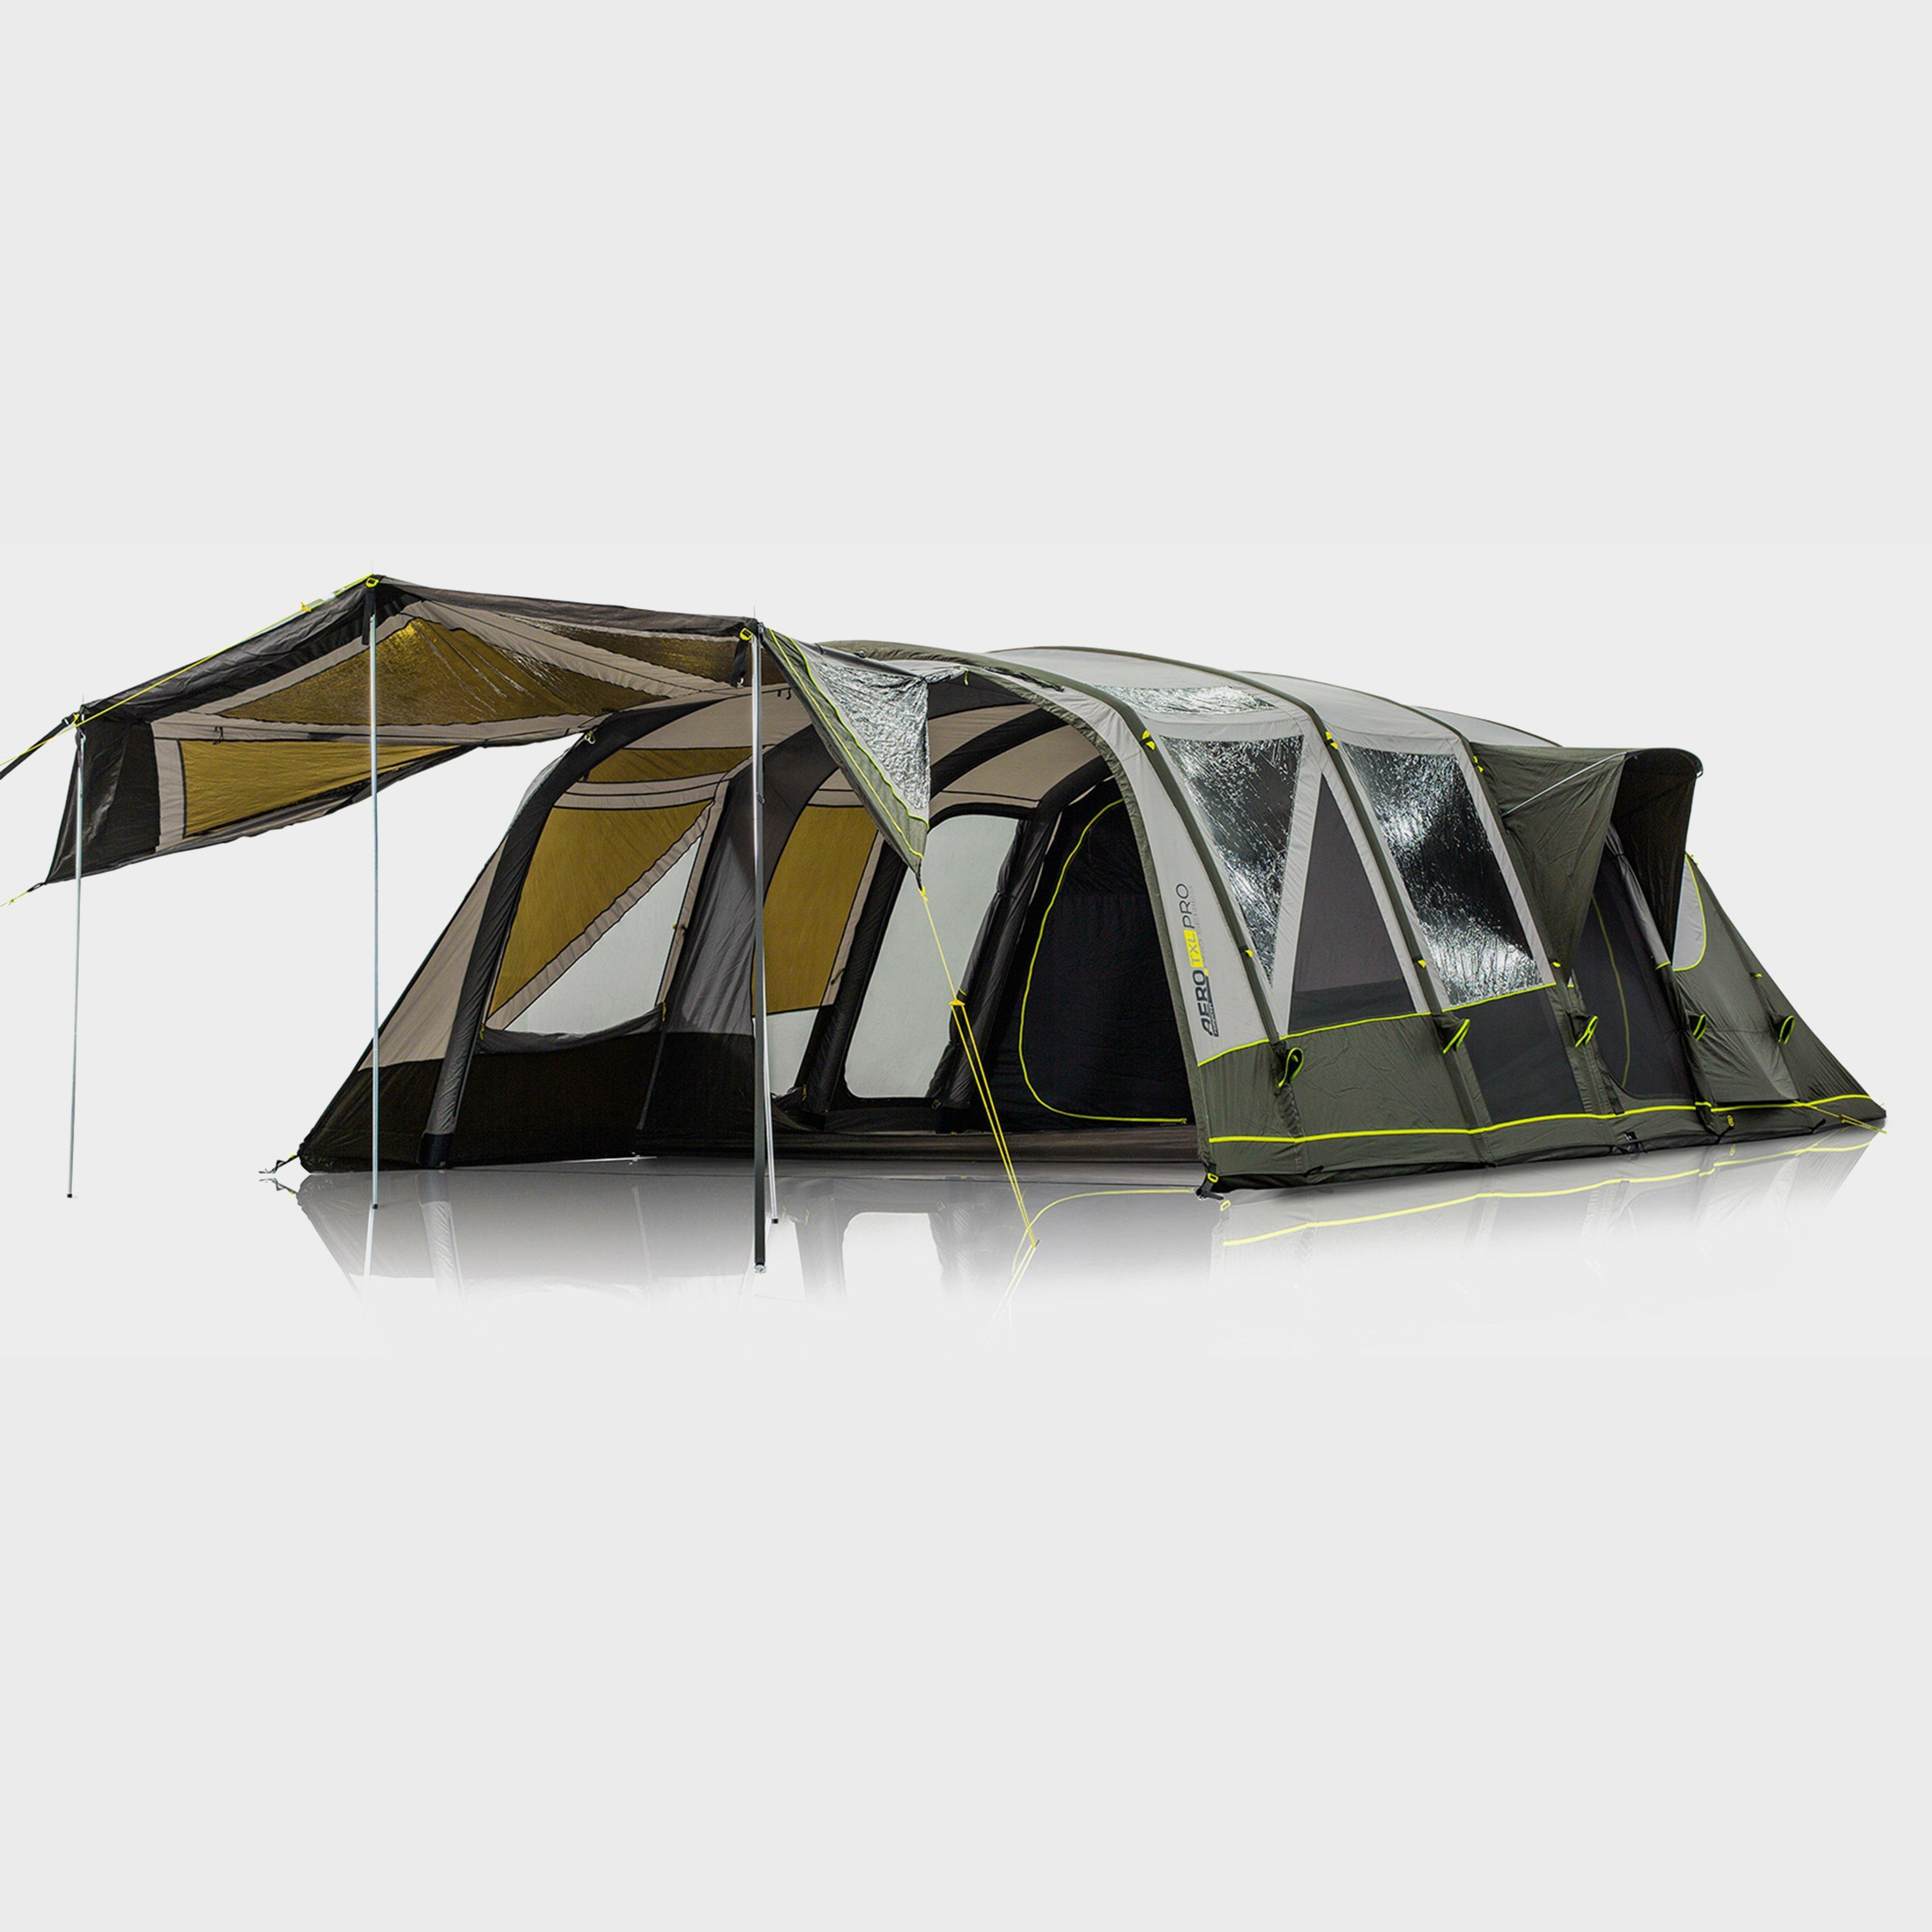 Zempire Aero Txl Lite Family Air Tent - Pro/Pro, PRO/PRO